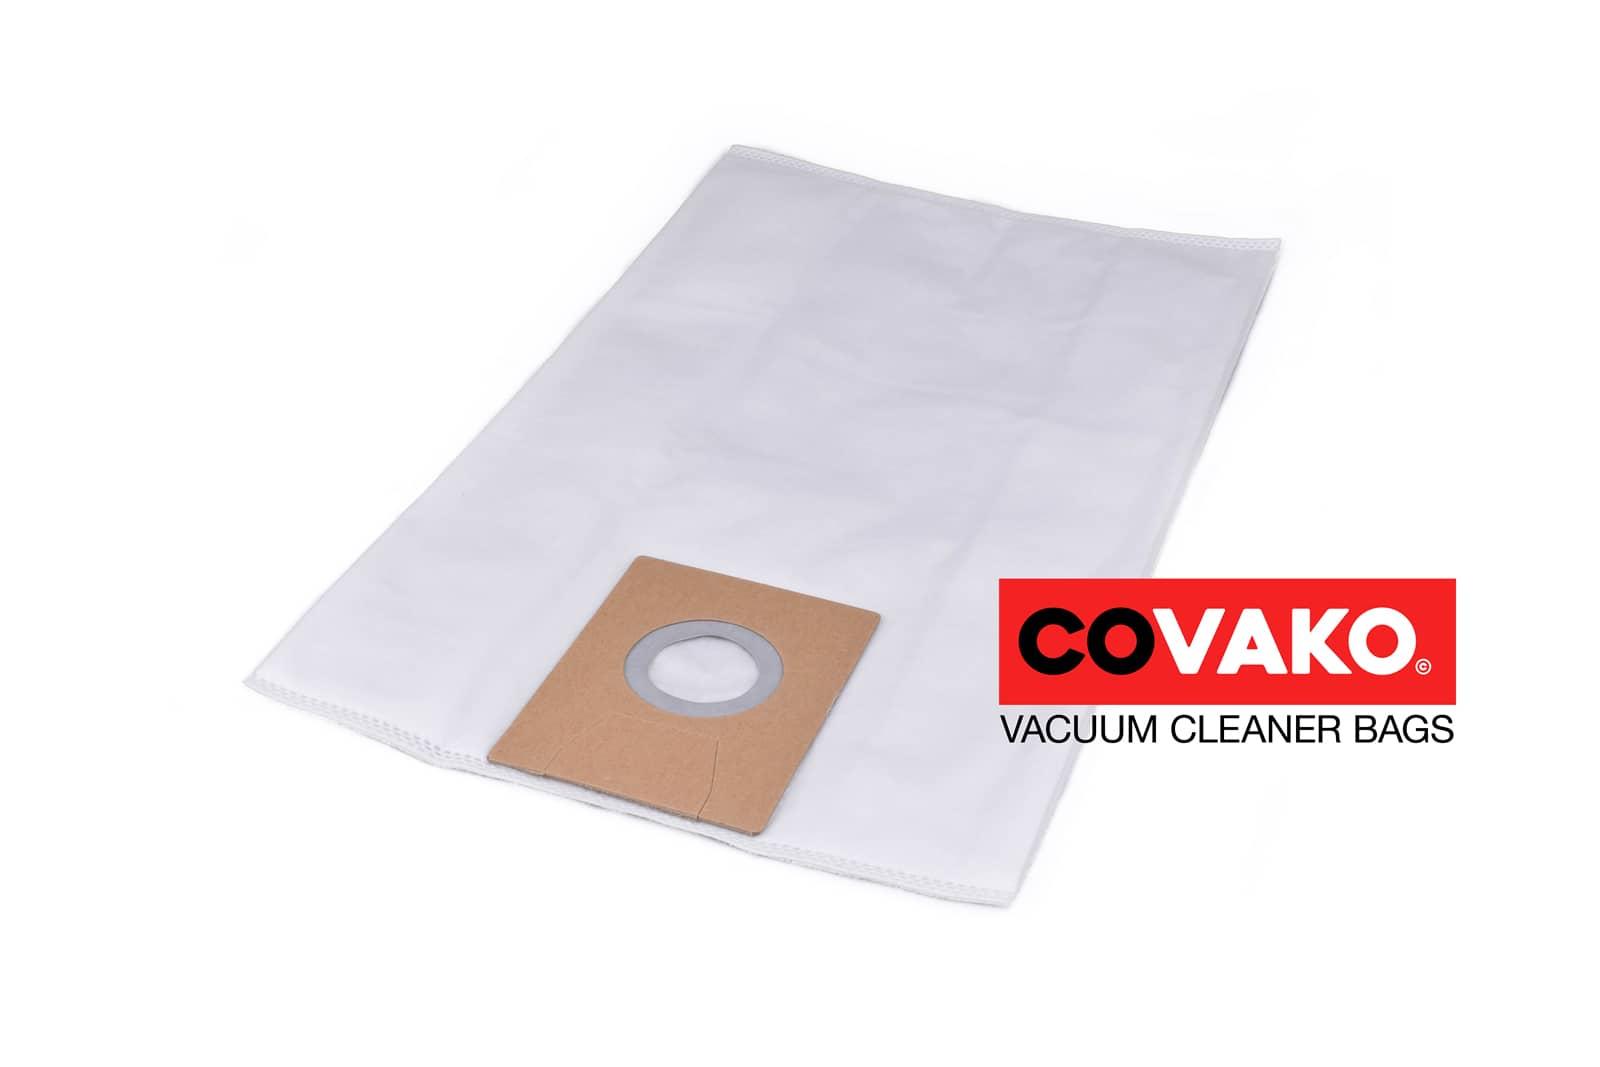 Comac CA 30 / Synthetisch - Comac Staubsaugerbeutel